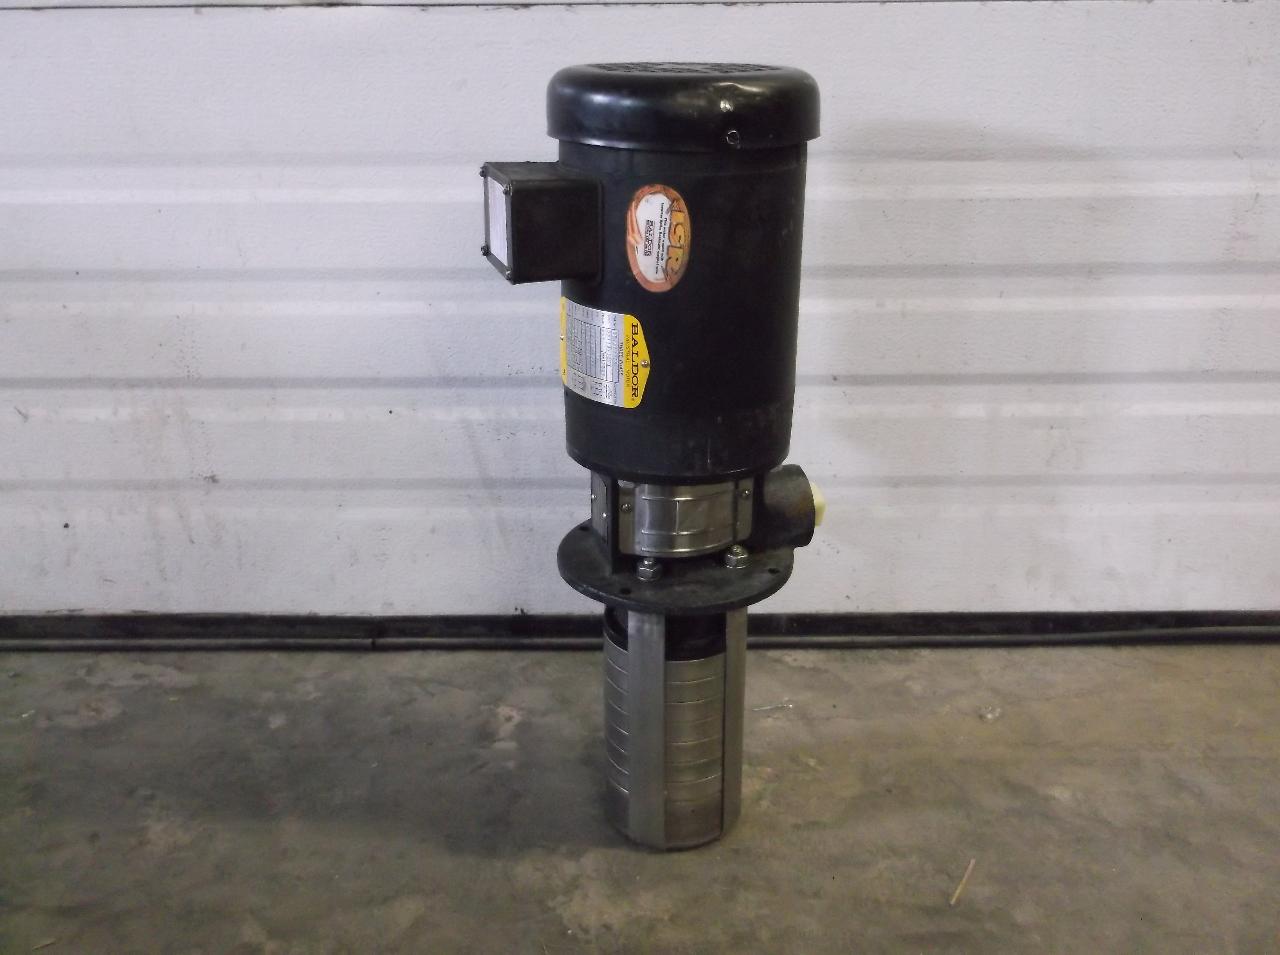 Grundfos crk2 60 verticle high presure pump baldor 1 5 hp Baldor industrial motor pump